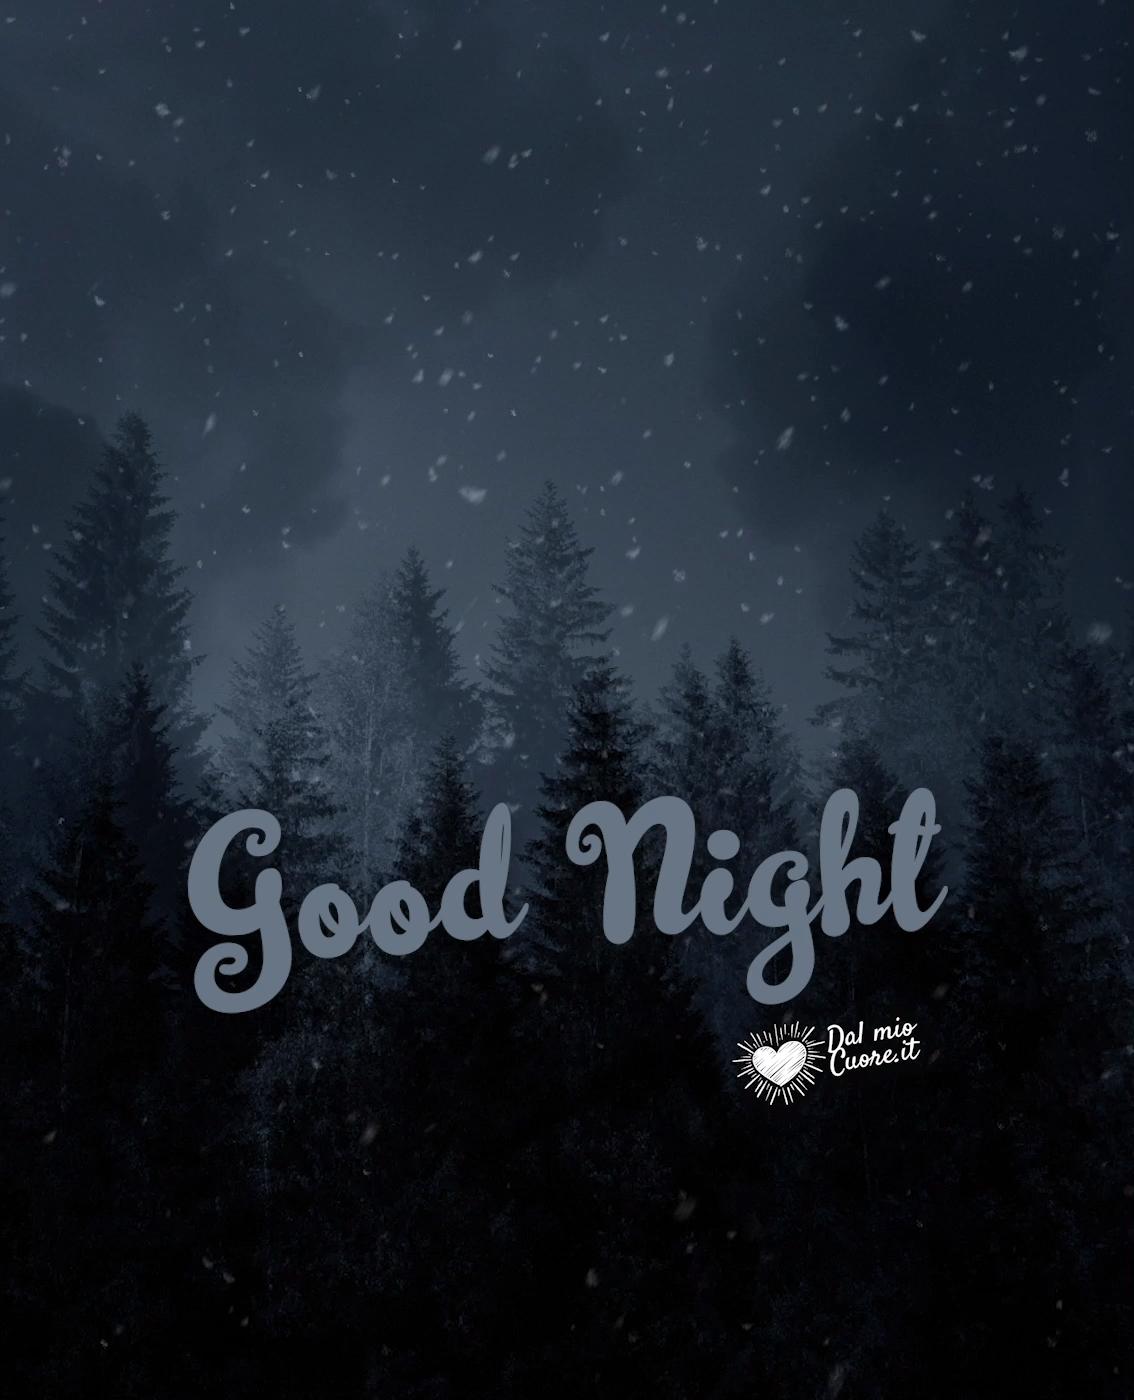 Good Night Video With Falling Snow In 2021 Good Night Night Good Night Image